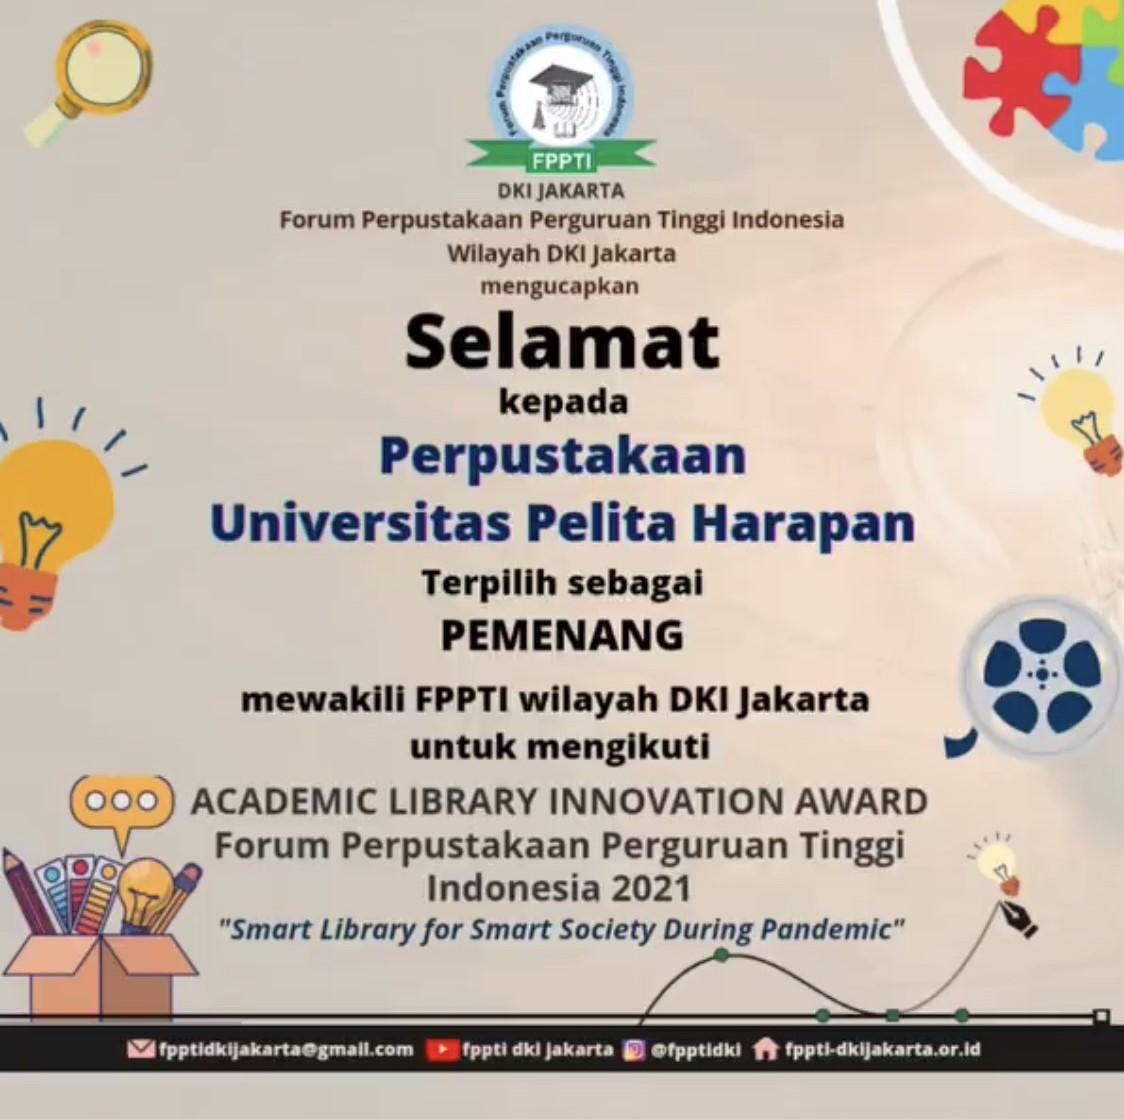 The Johannes Oentoro Library UPH Raih Juara 1 ALIA 2021 Tingkat Provinsi DKI Jakarta